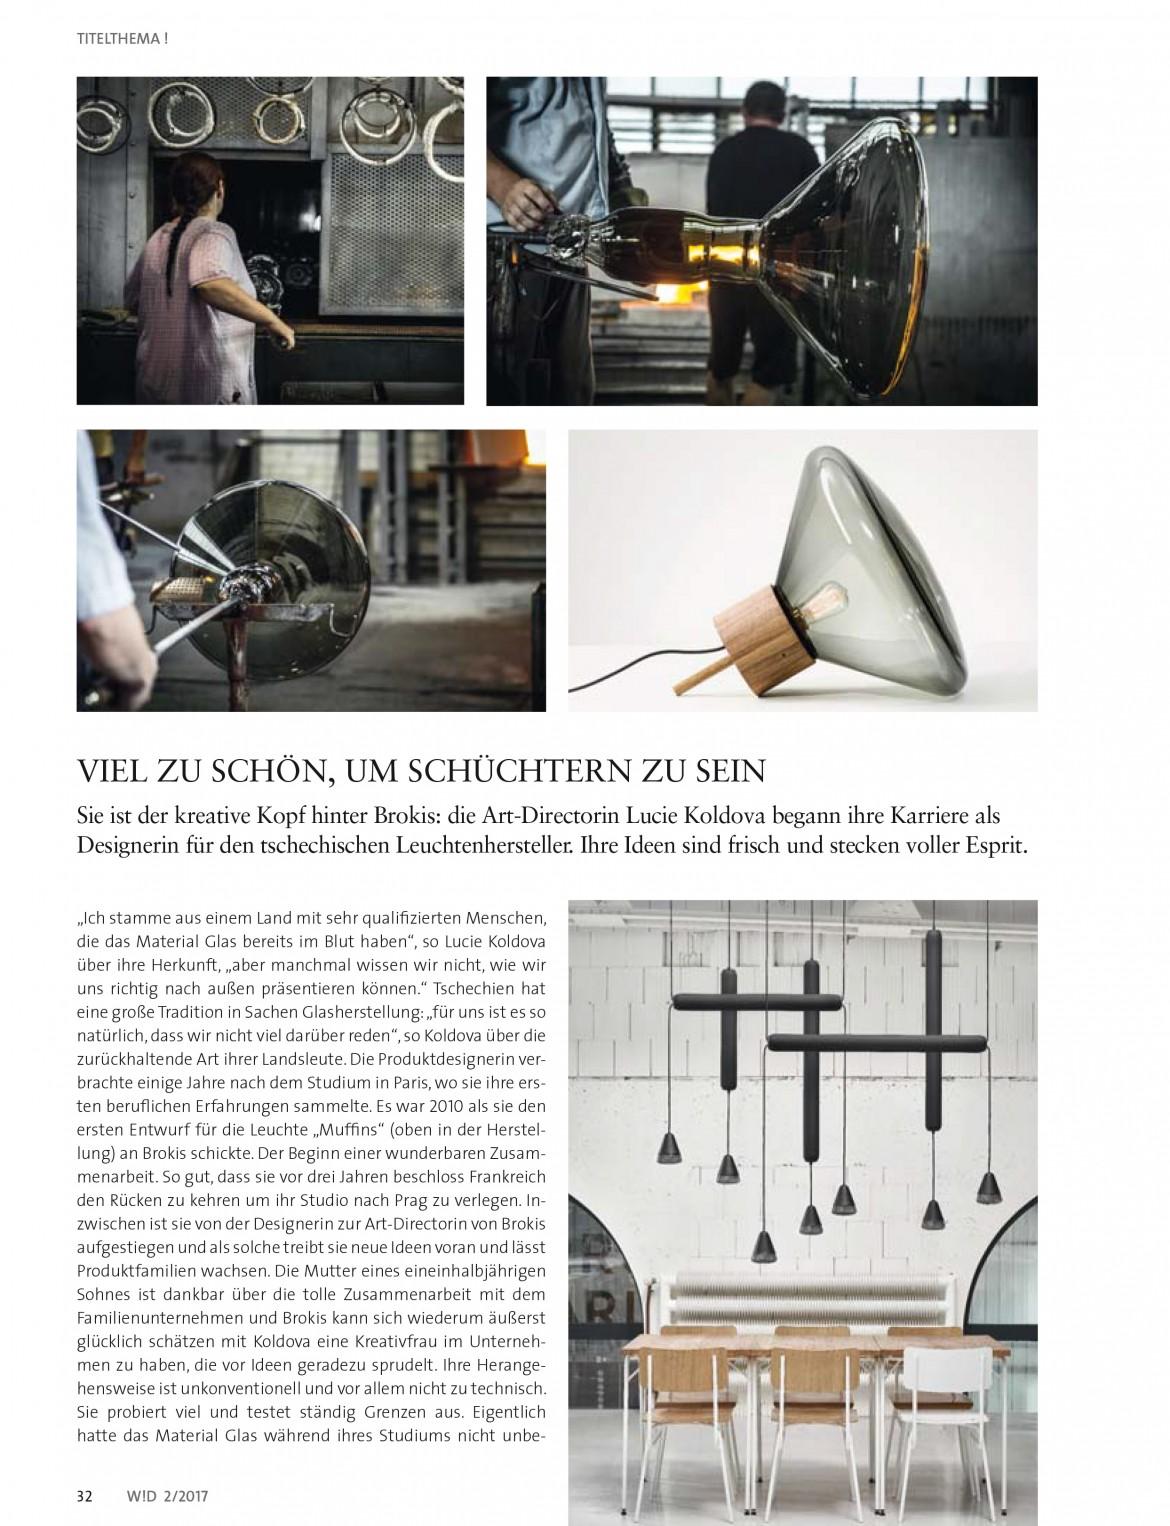 Brand.Kiosk_Wohn!Design_Brokis_2